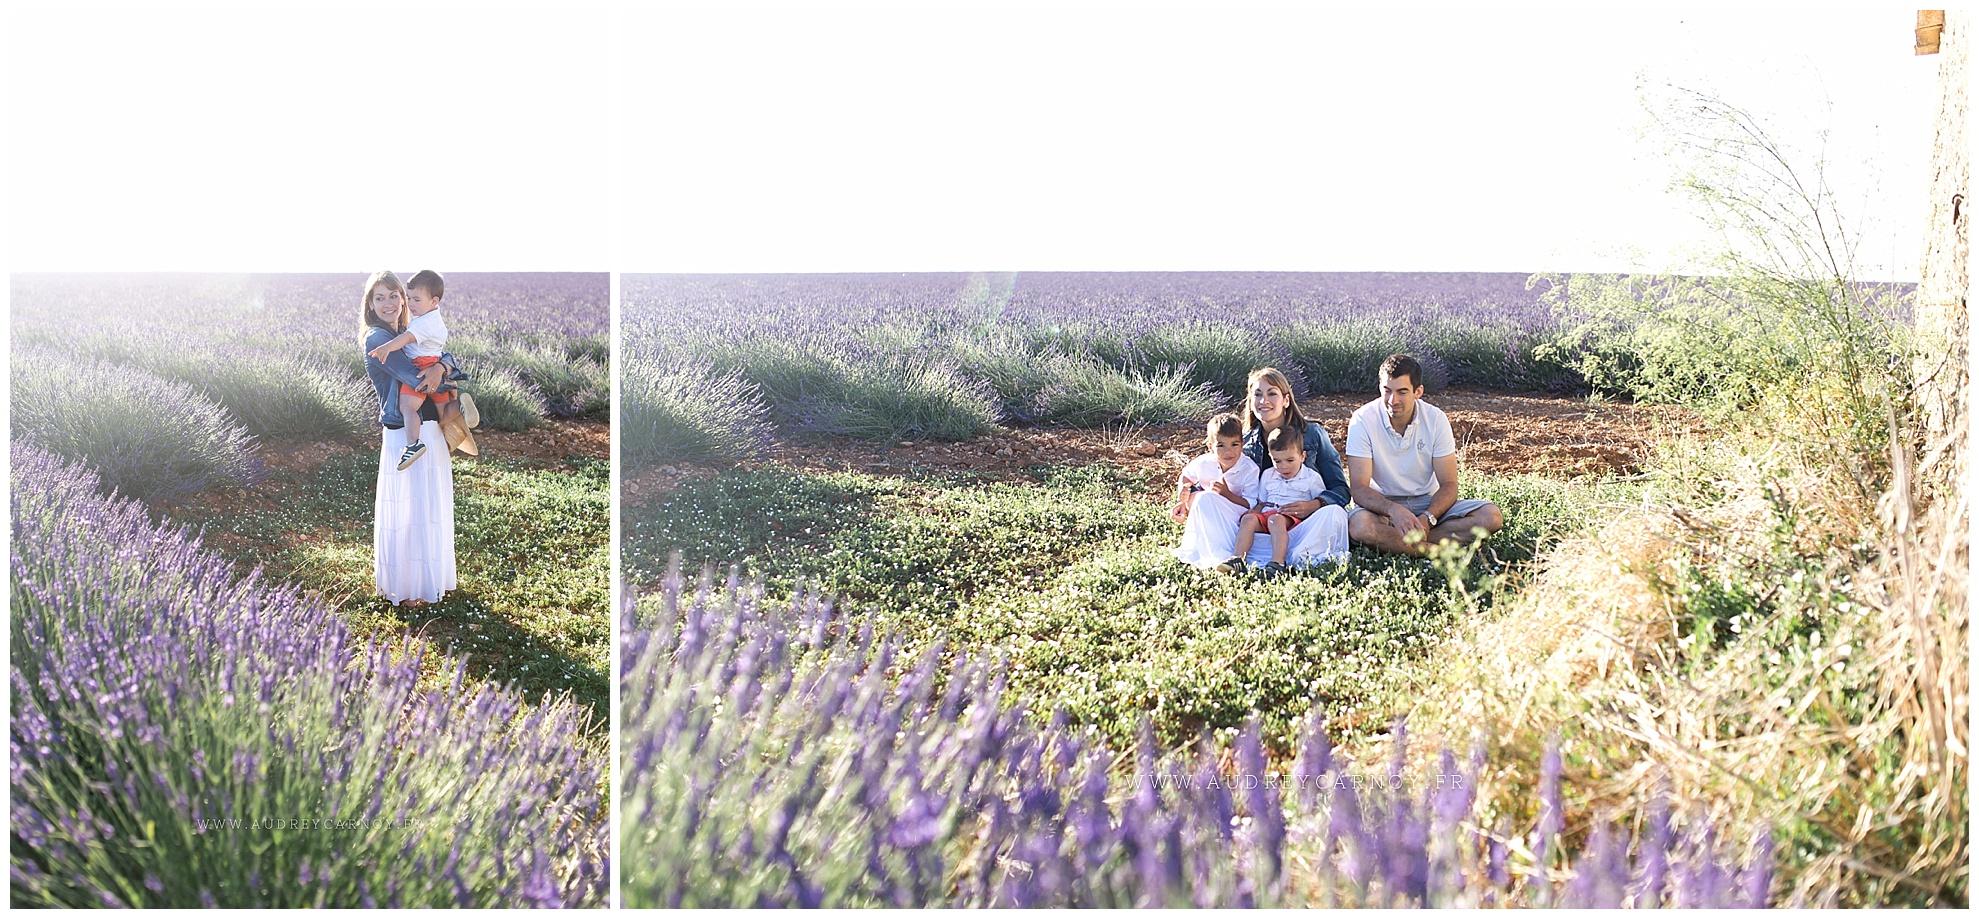 Séance famille - Valensole | Nathalie 11